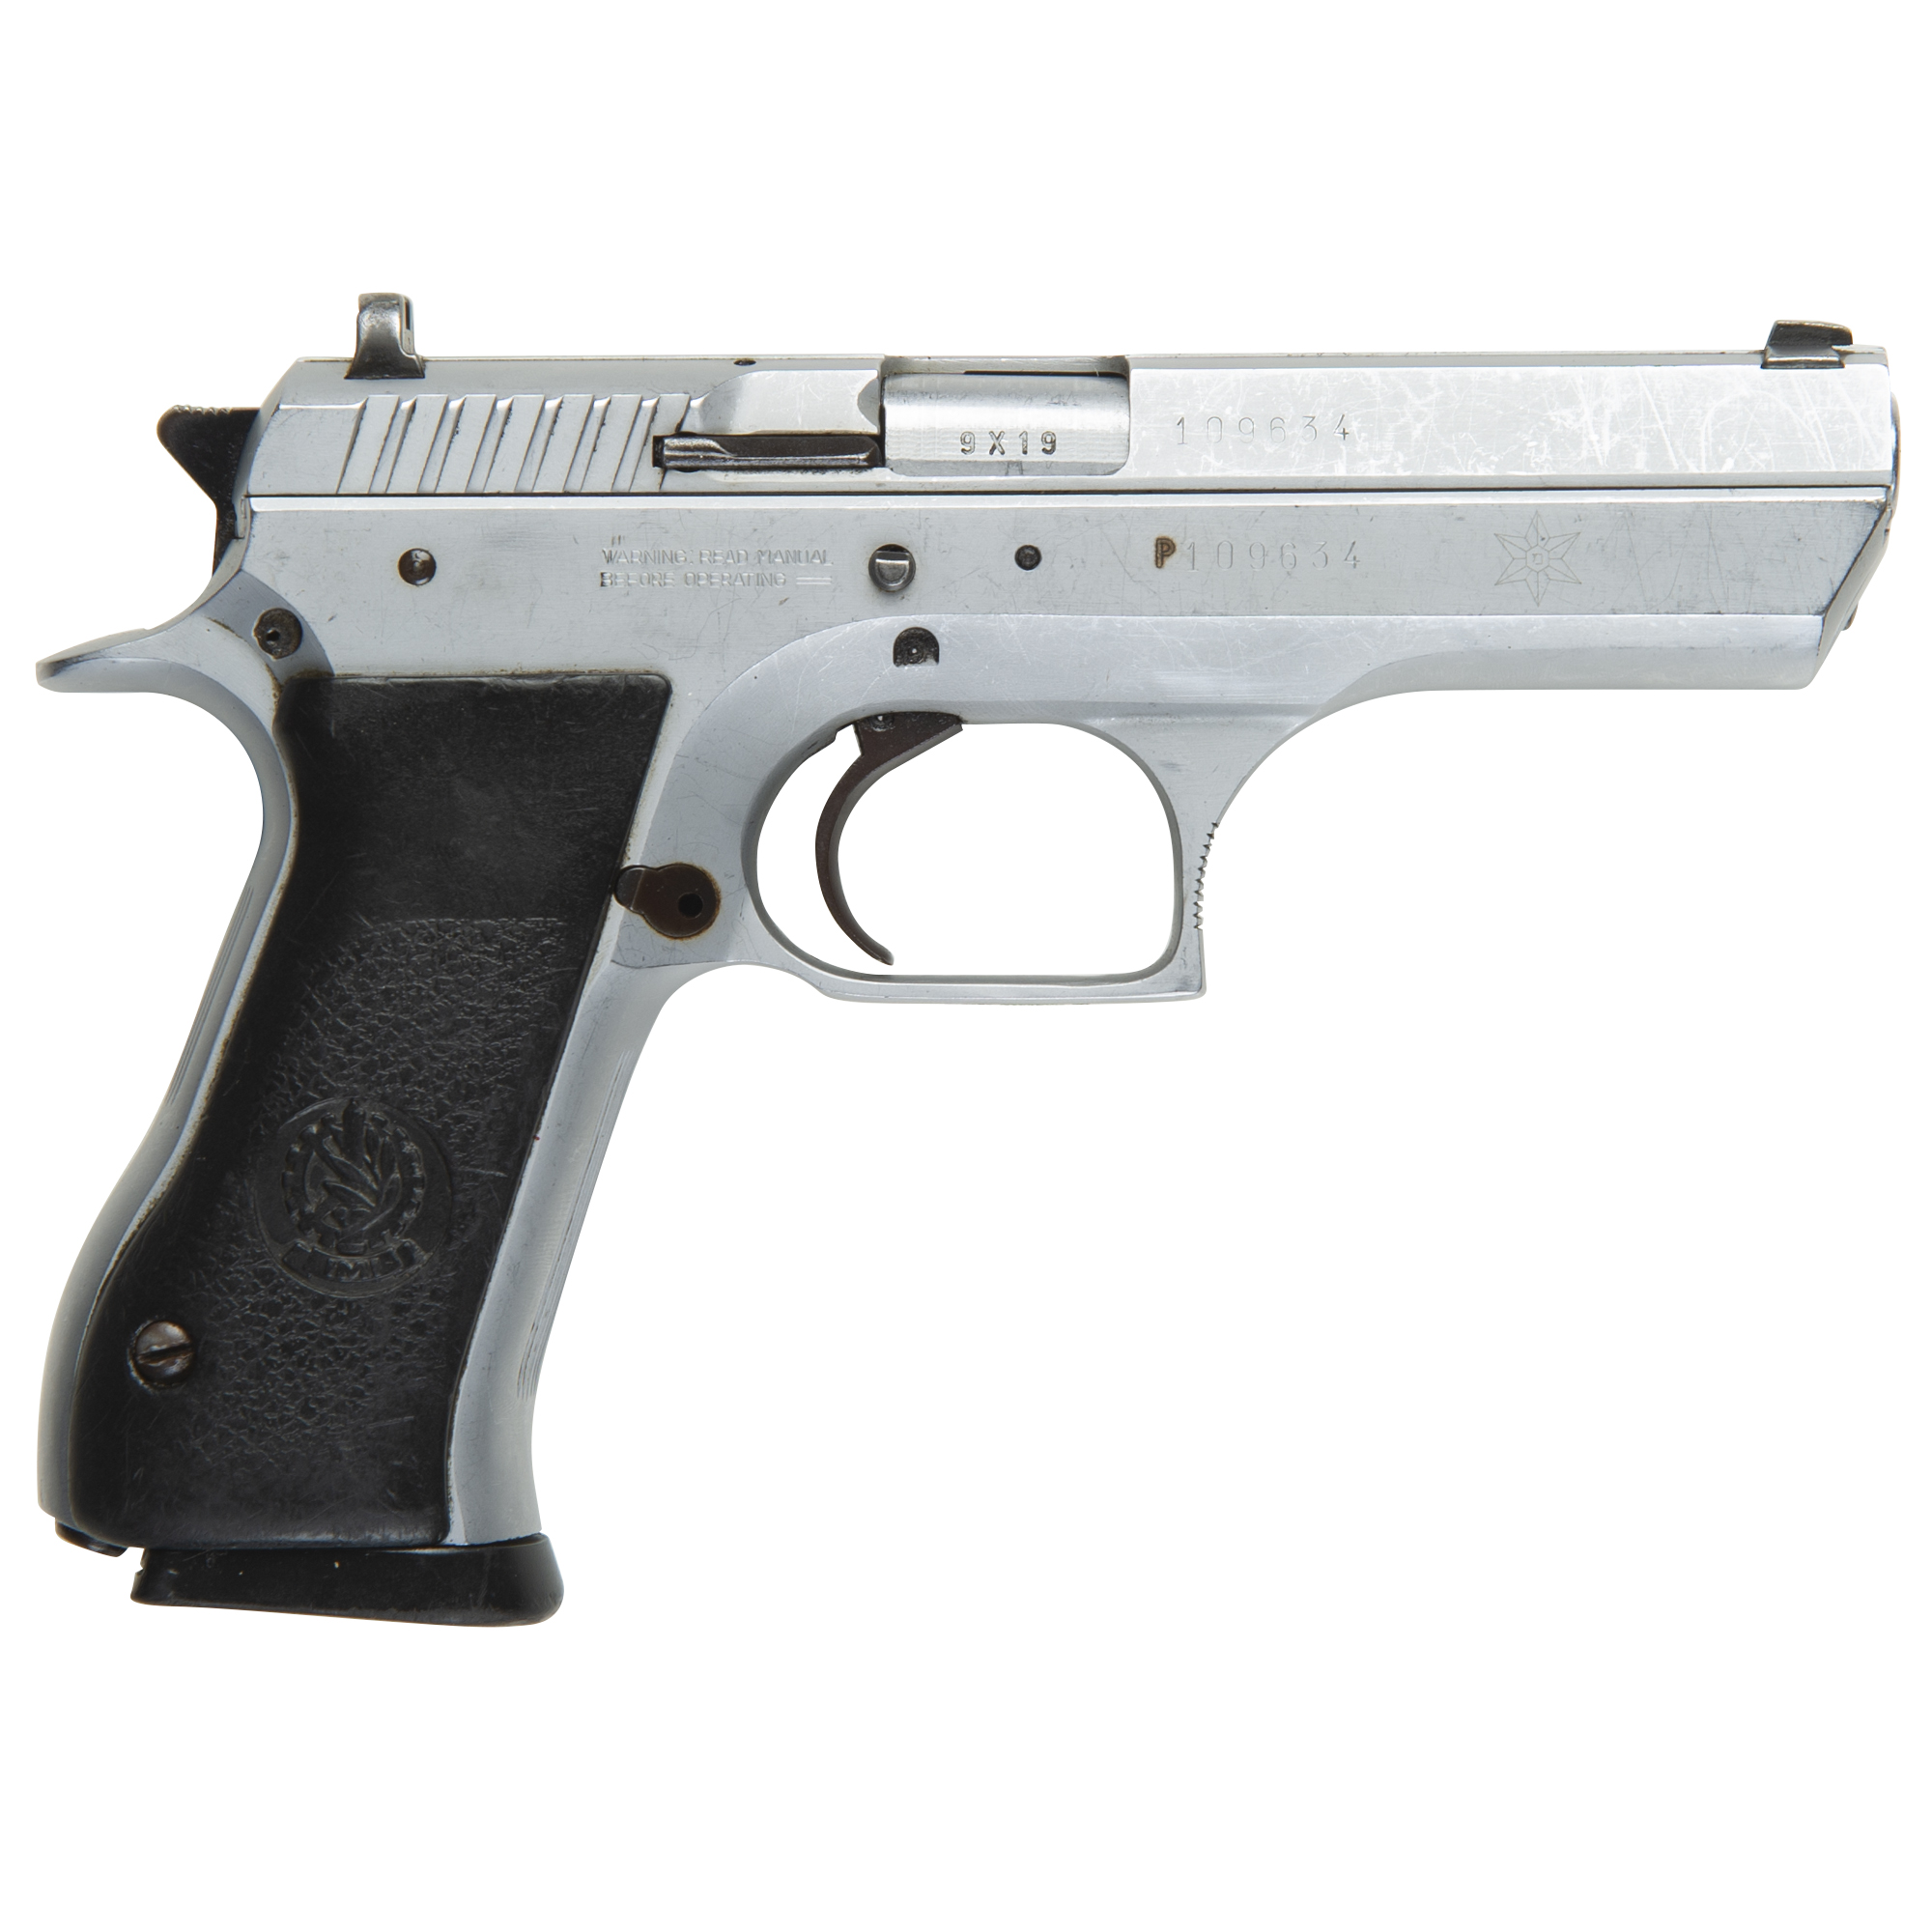 Used Jericho 941F Handgun, 9mm, Brushed Steel w/Police Star Marking